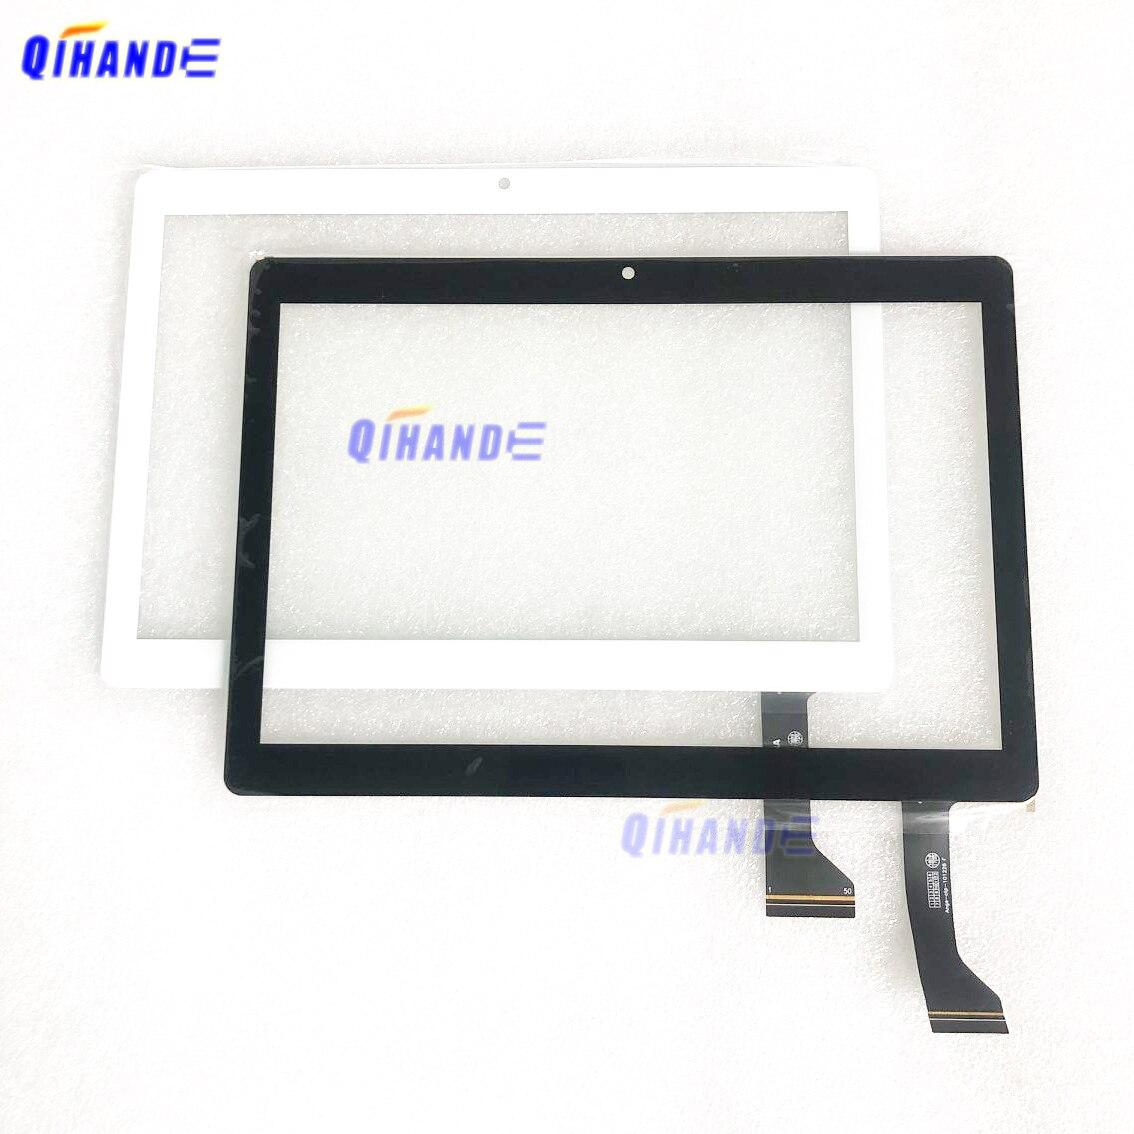 Nueva pantalla táctil para Tablet inteligente Angs-ctp-101226 de 10,1 pulgadas para niños, panel táctil, digitalizador de vidrio, sensor táctil, código angs-ctp-101226